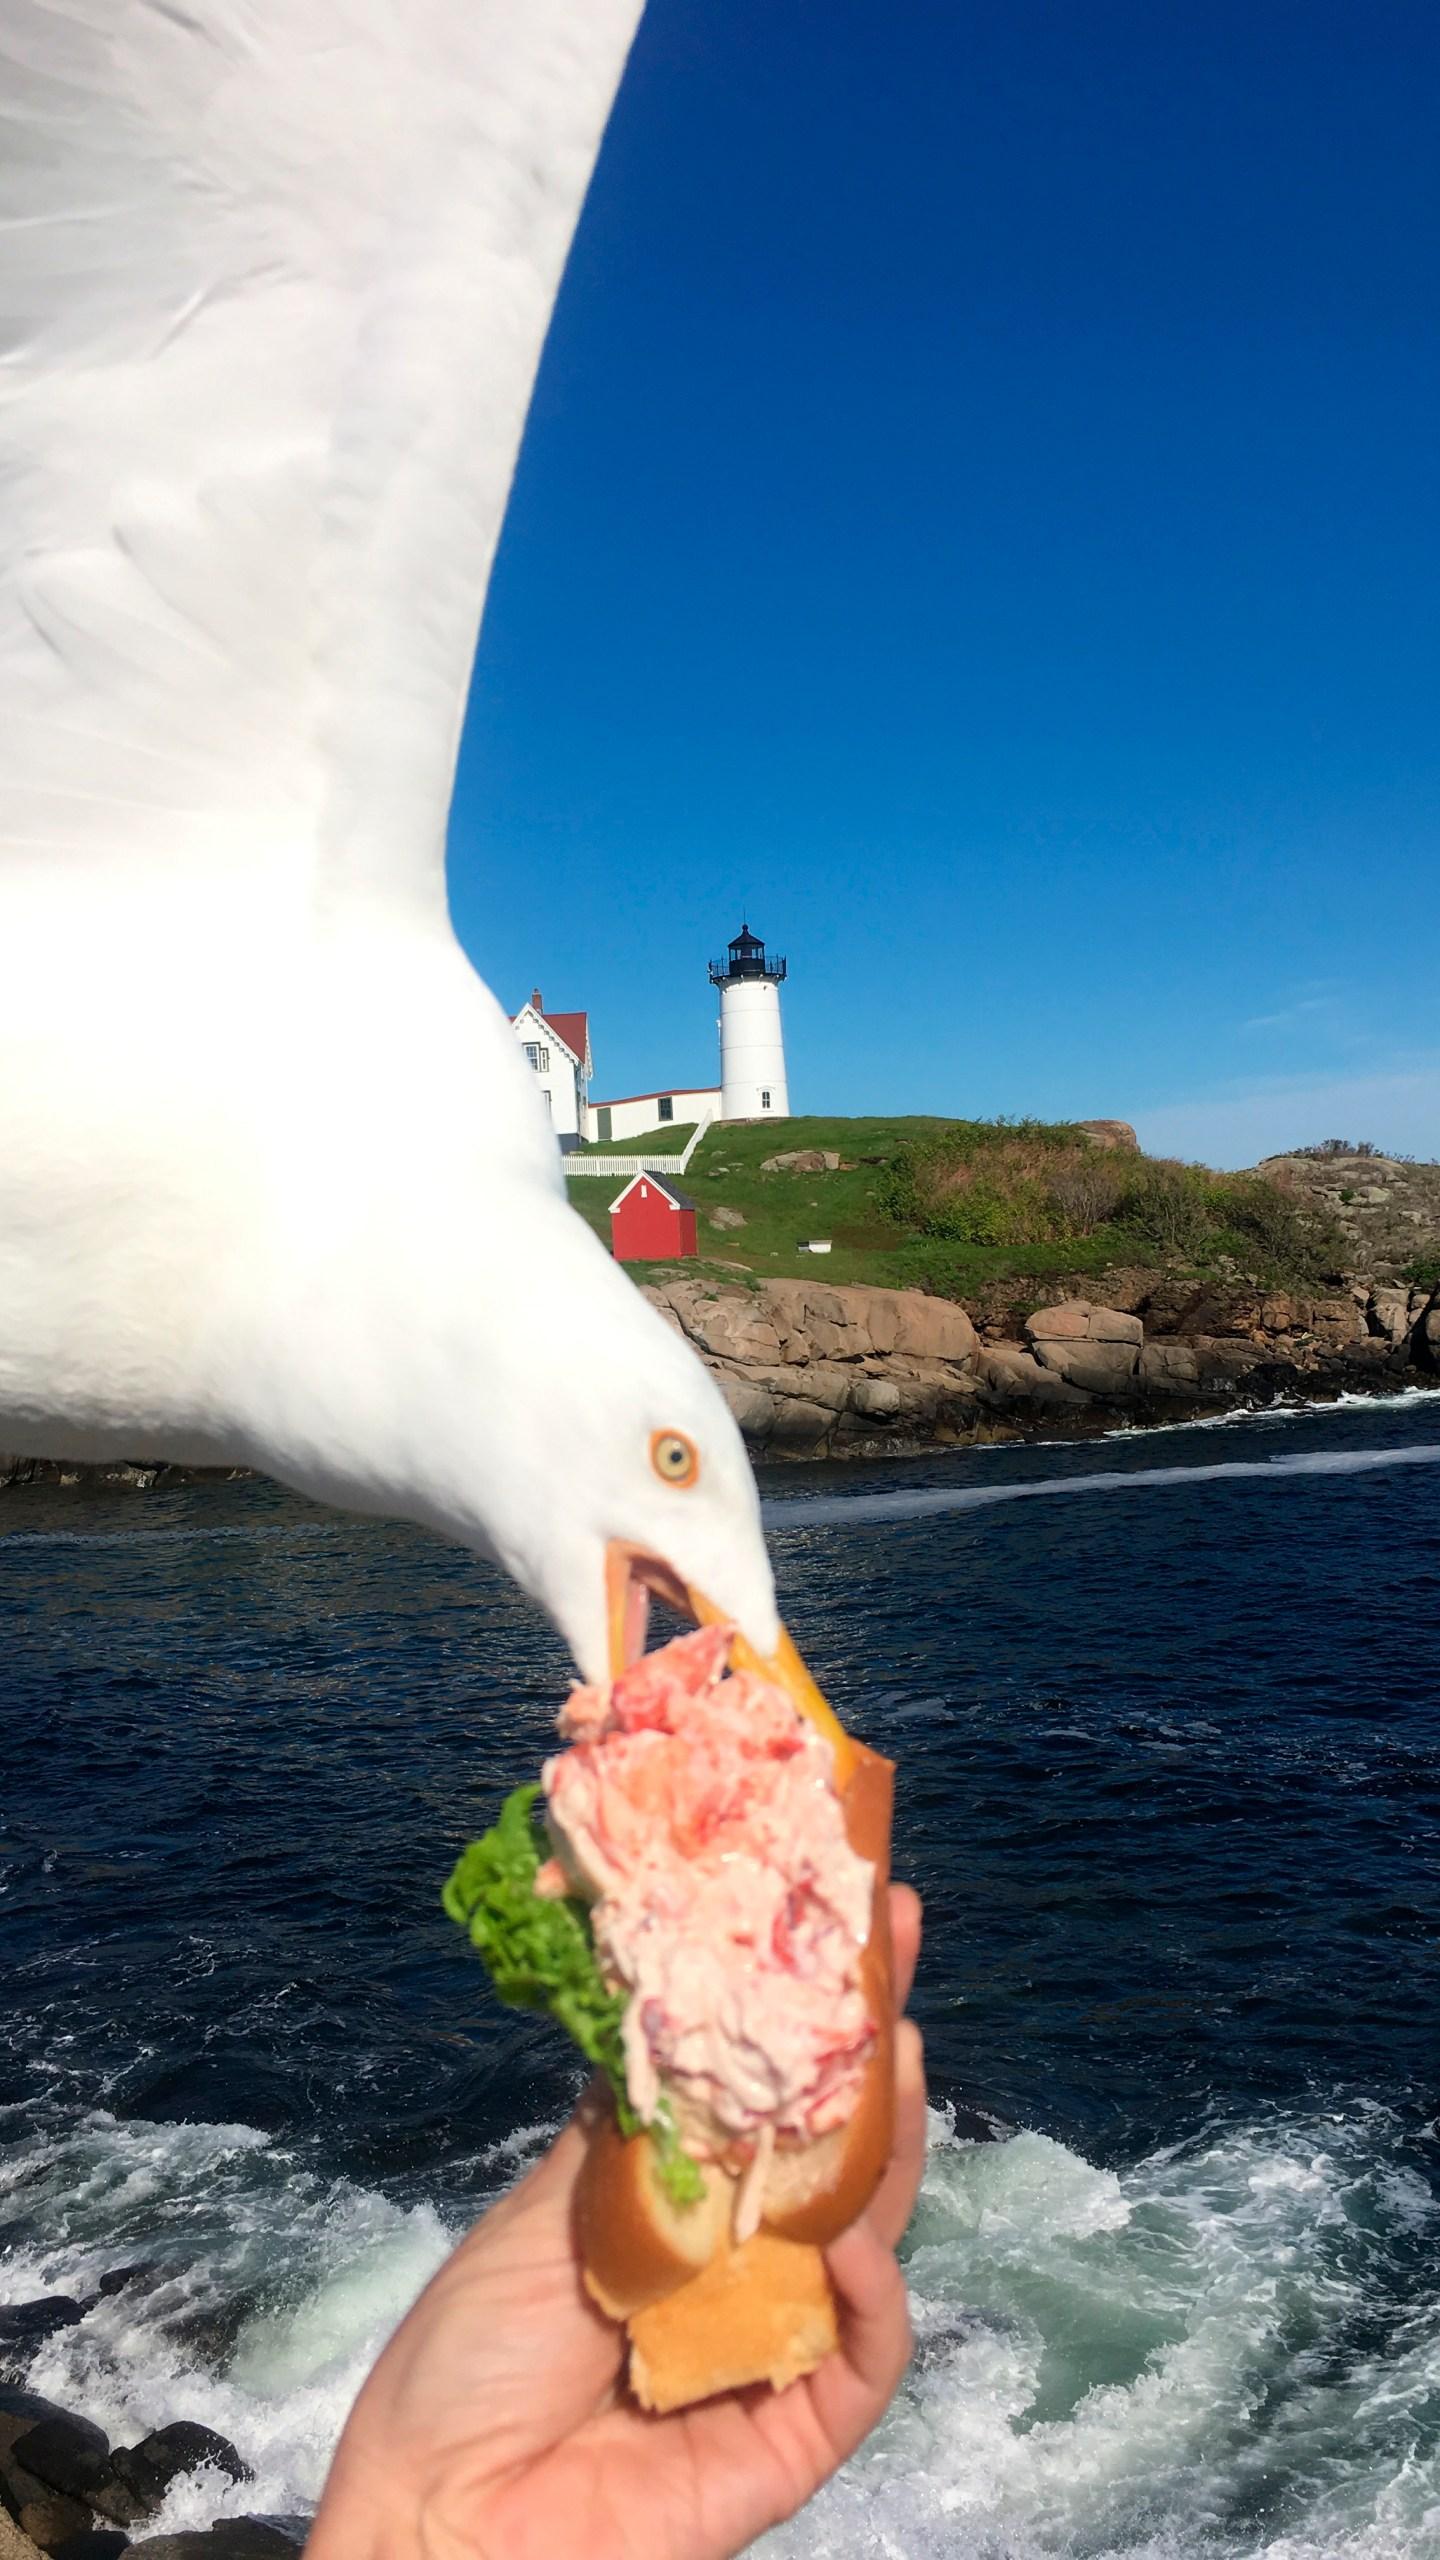 Seagull Photobomb_1560144155786